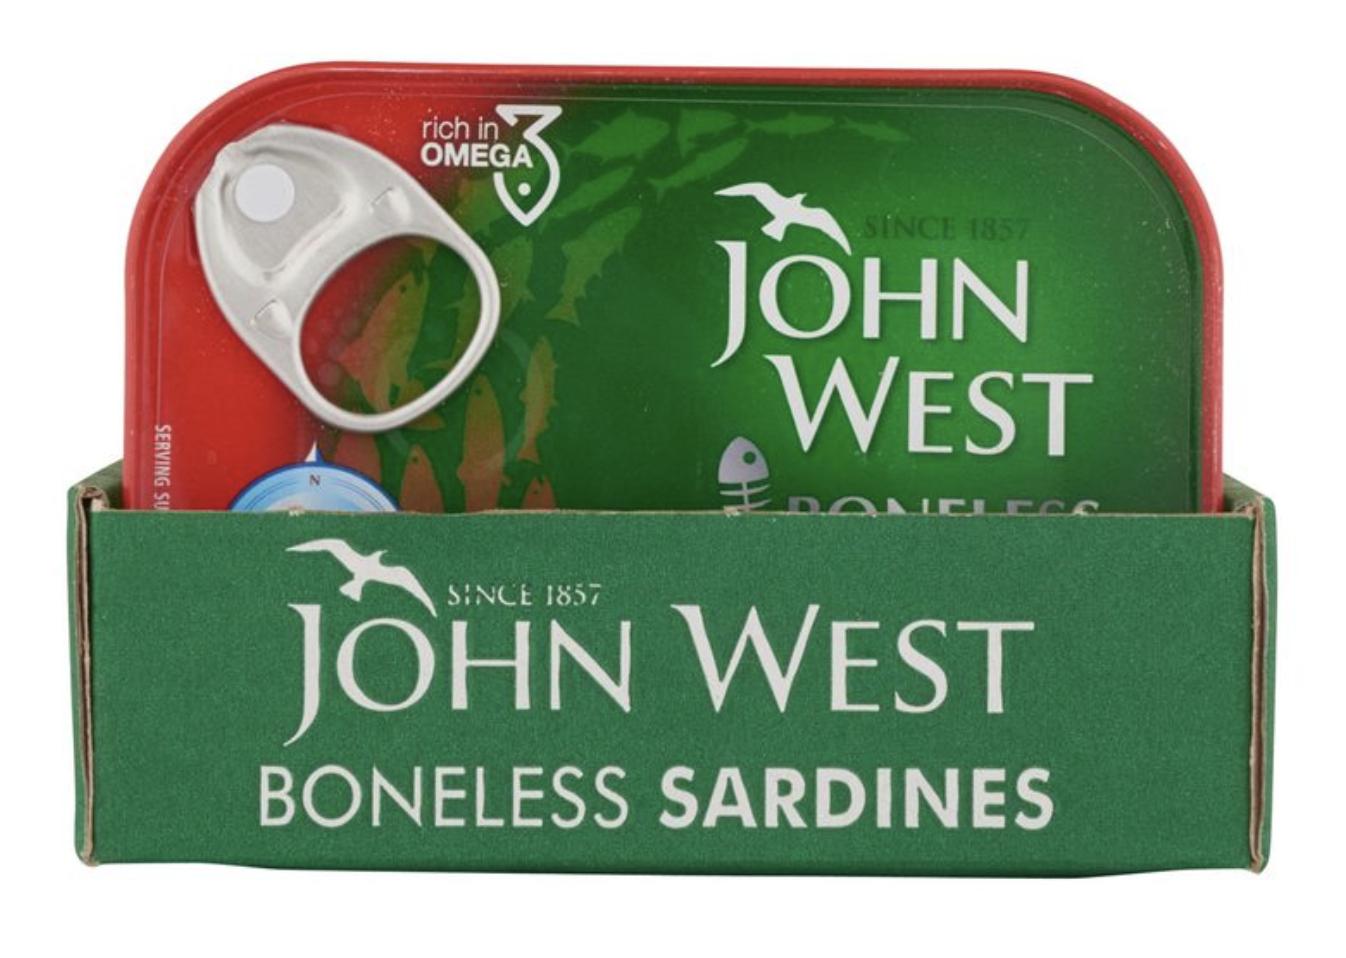 John West Boneless Sardines in Tomato Sauce, 12 x 95g - £7.99 Instore @ Costco